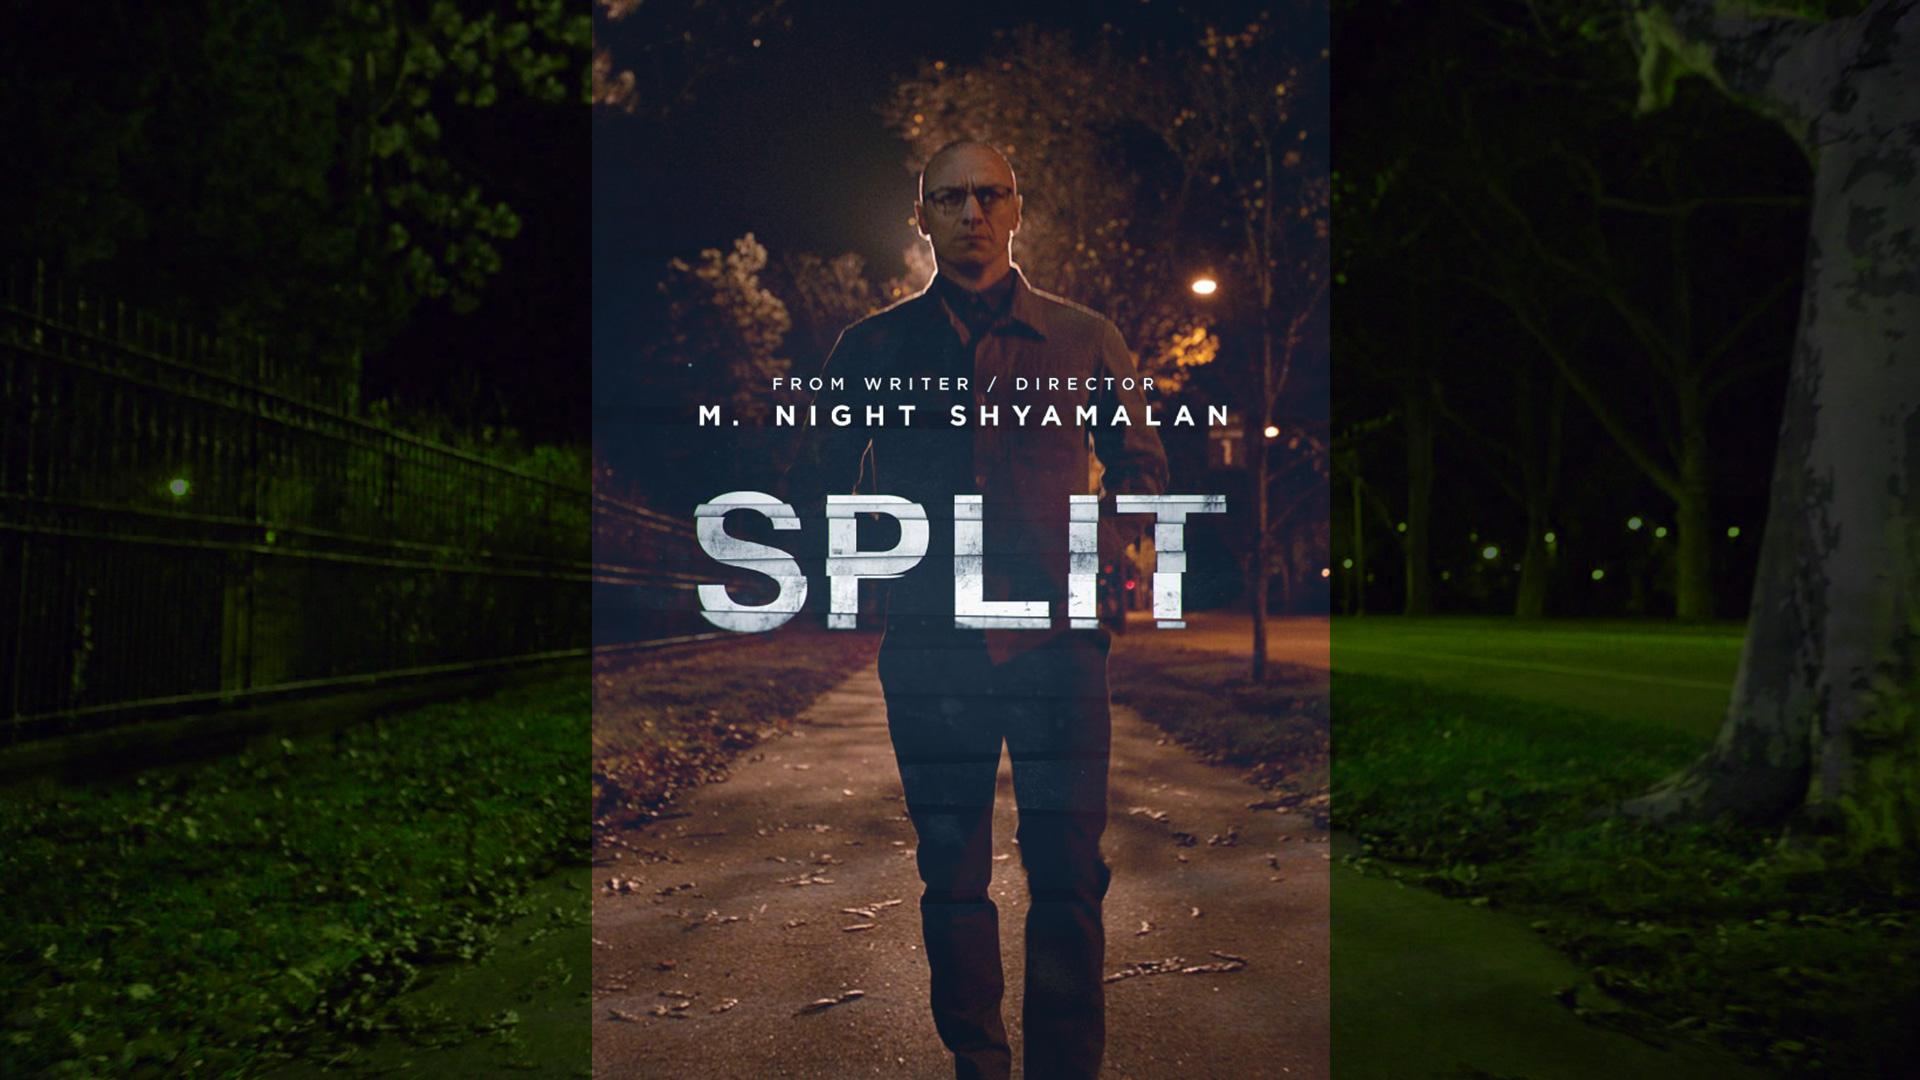 split-movie-wallpaper-hd-film-2017-poster-image.jpg